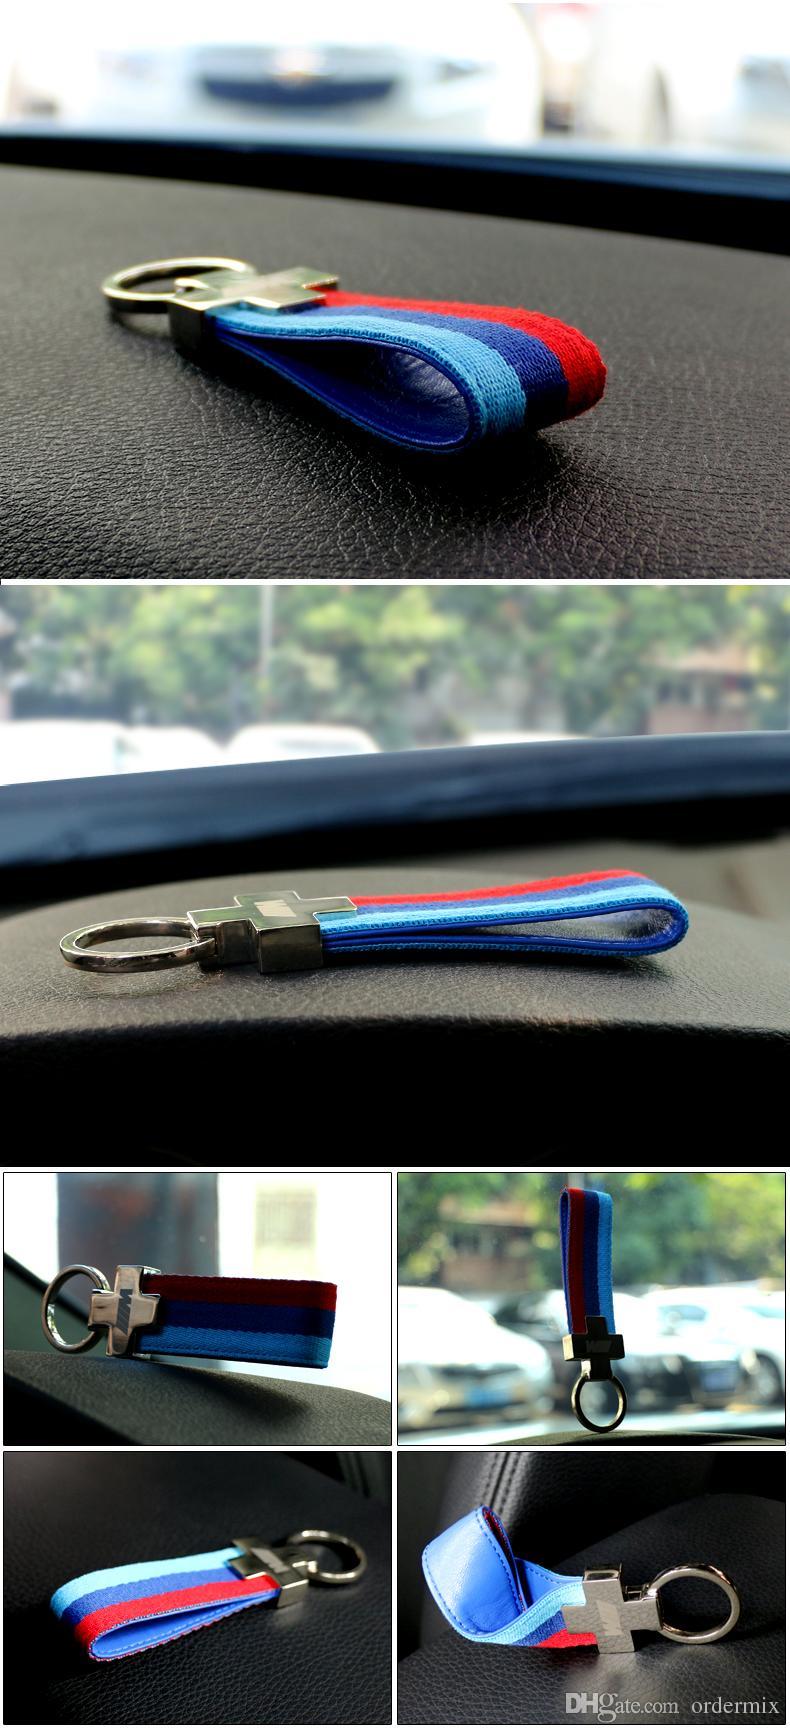 M Tech M Sport Leather Belt Chrome Keyring Keychain For BMW E46 E39 E60 F30 E90 F10 F30 E36 X5 E53 E30 E34 X1 X3 M3 M5 Key Chain